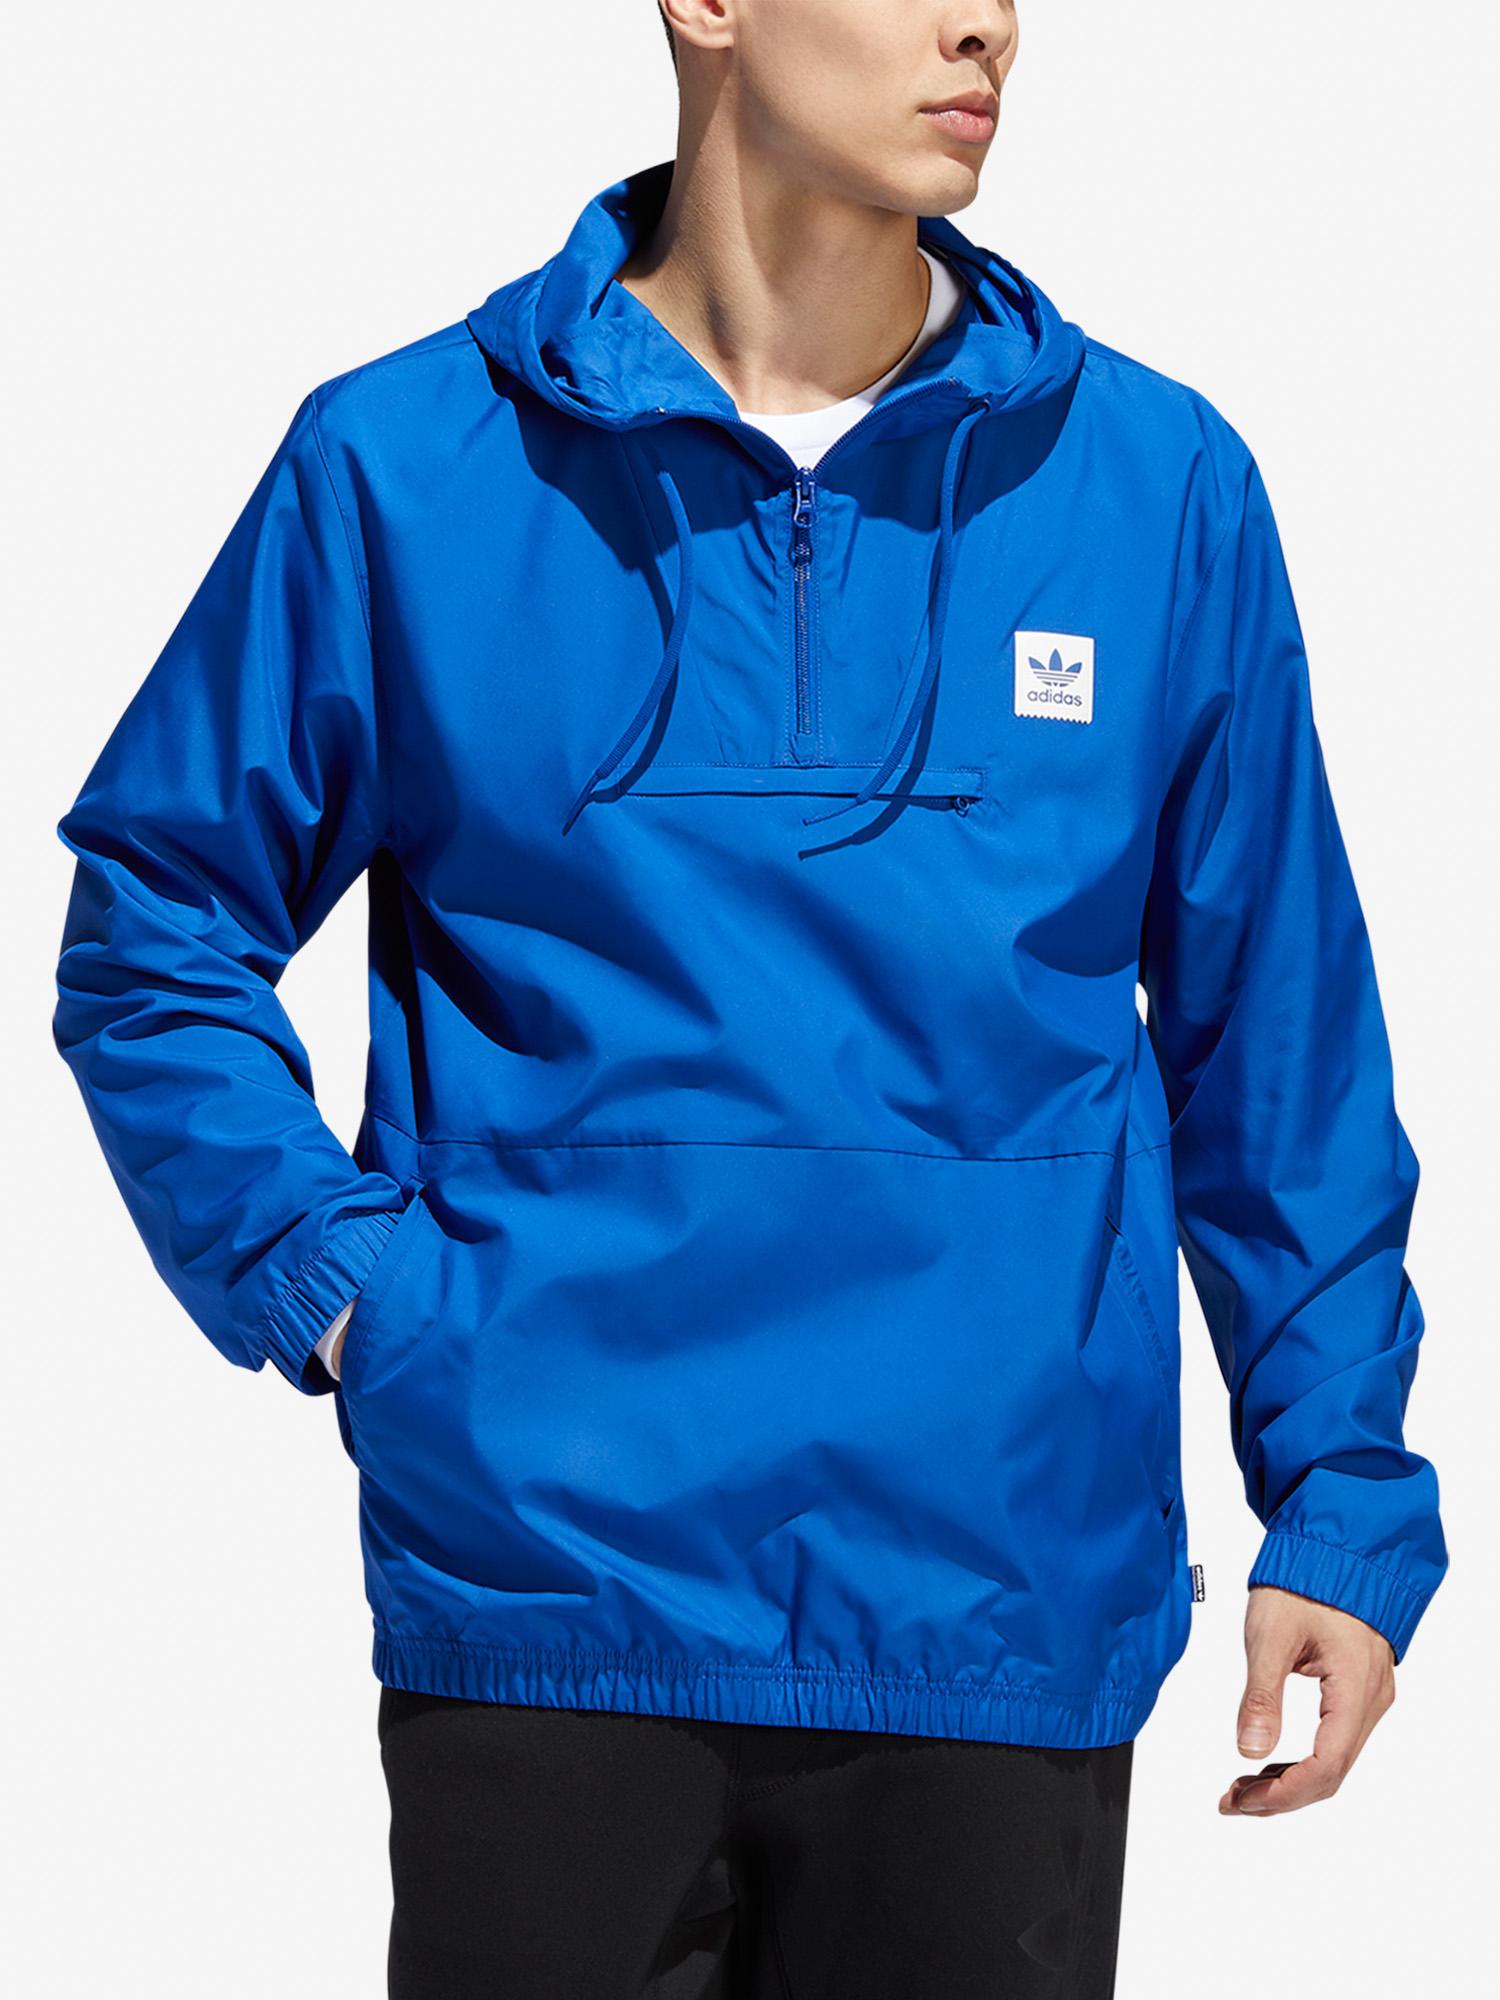 Adidas Originals Hipjacket Jacket